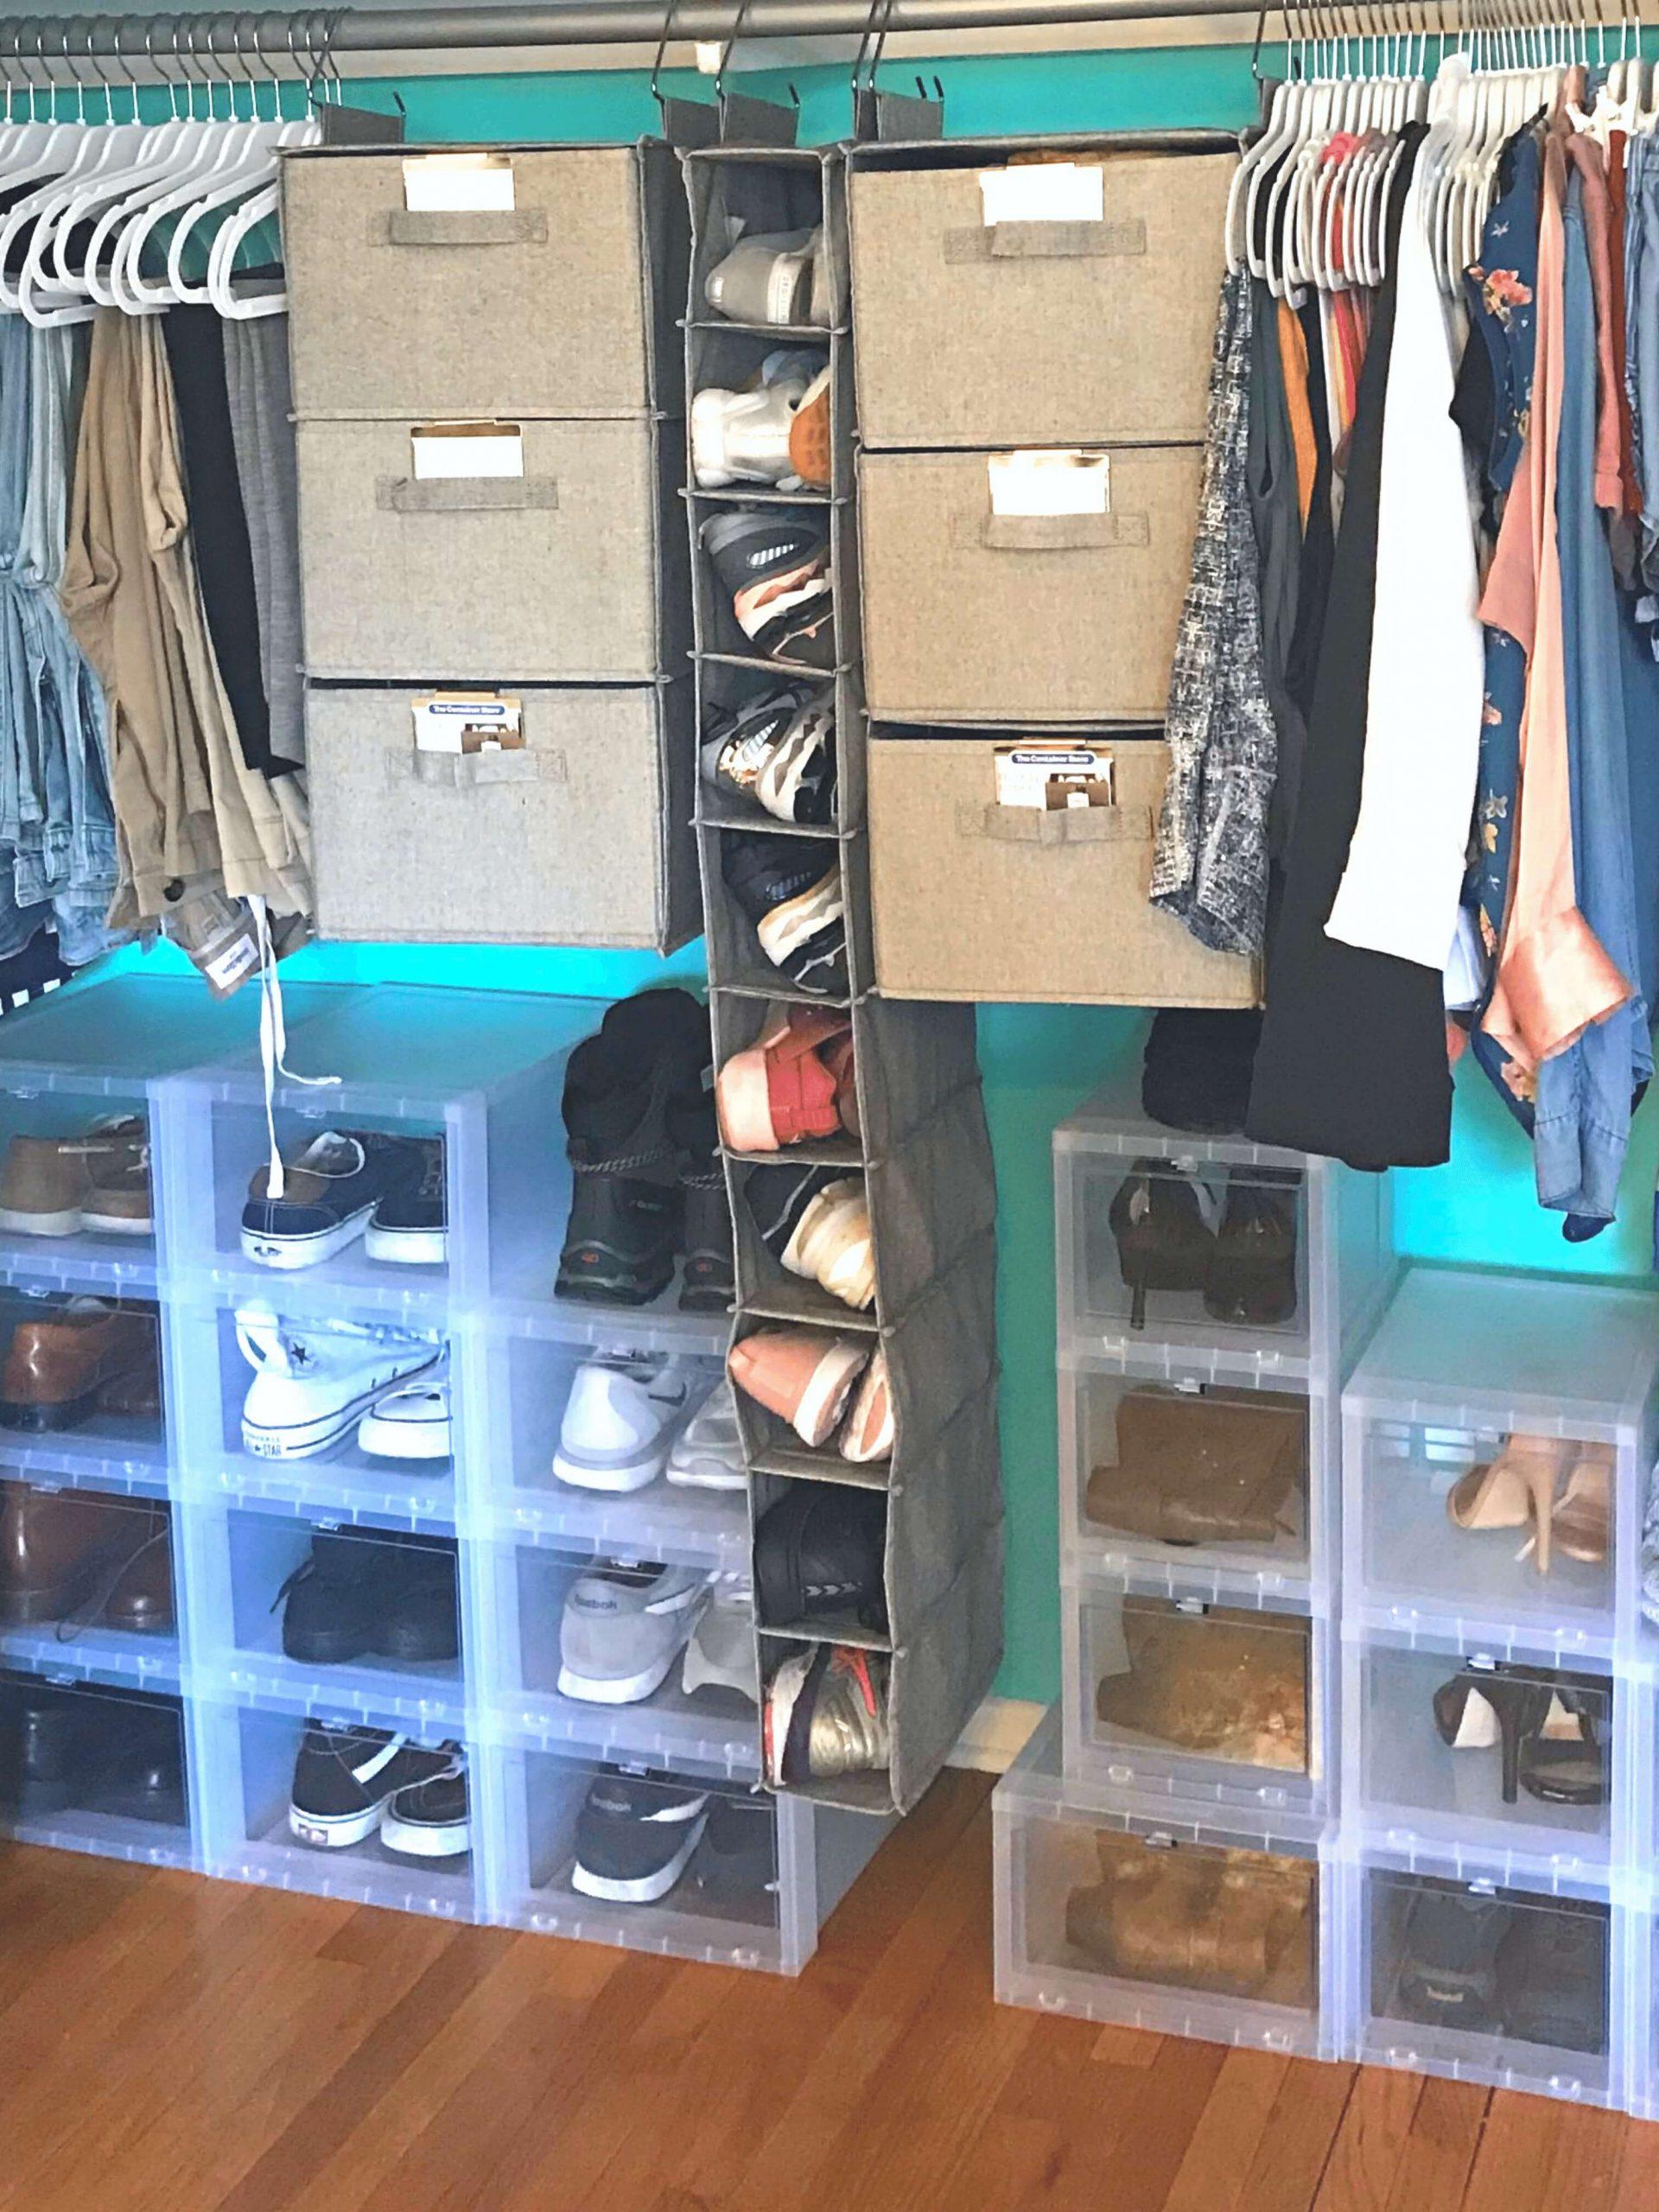 Melinda Grace Organizing Closet Redesign with teal paint, chrome hanging rod, shoe bins & hanging bins